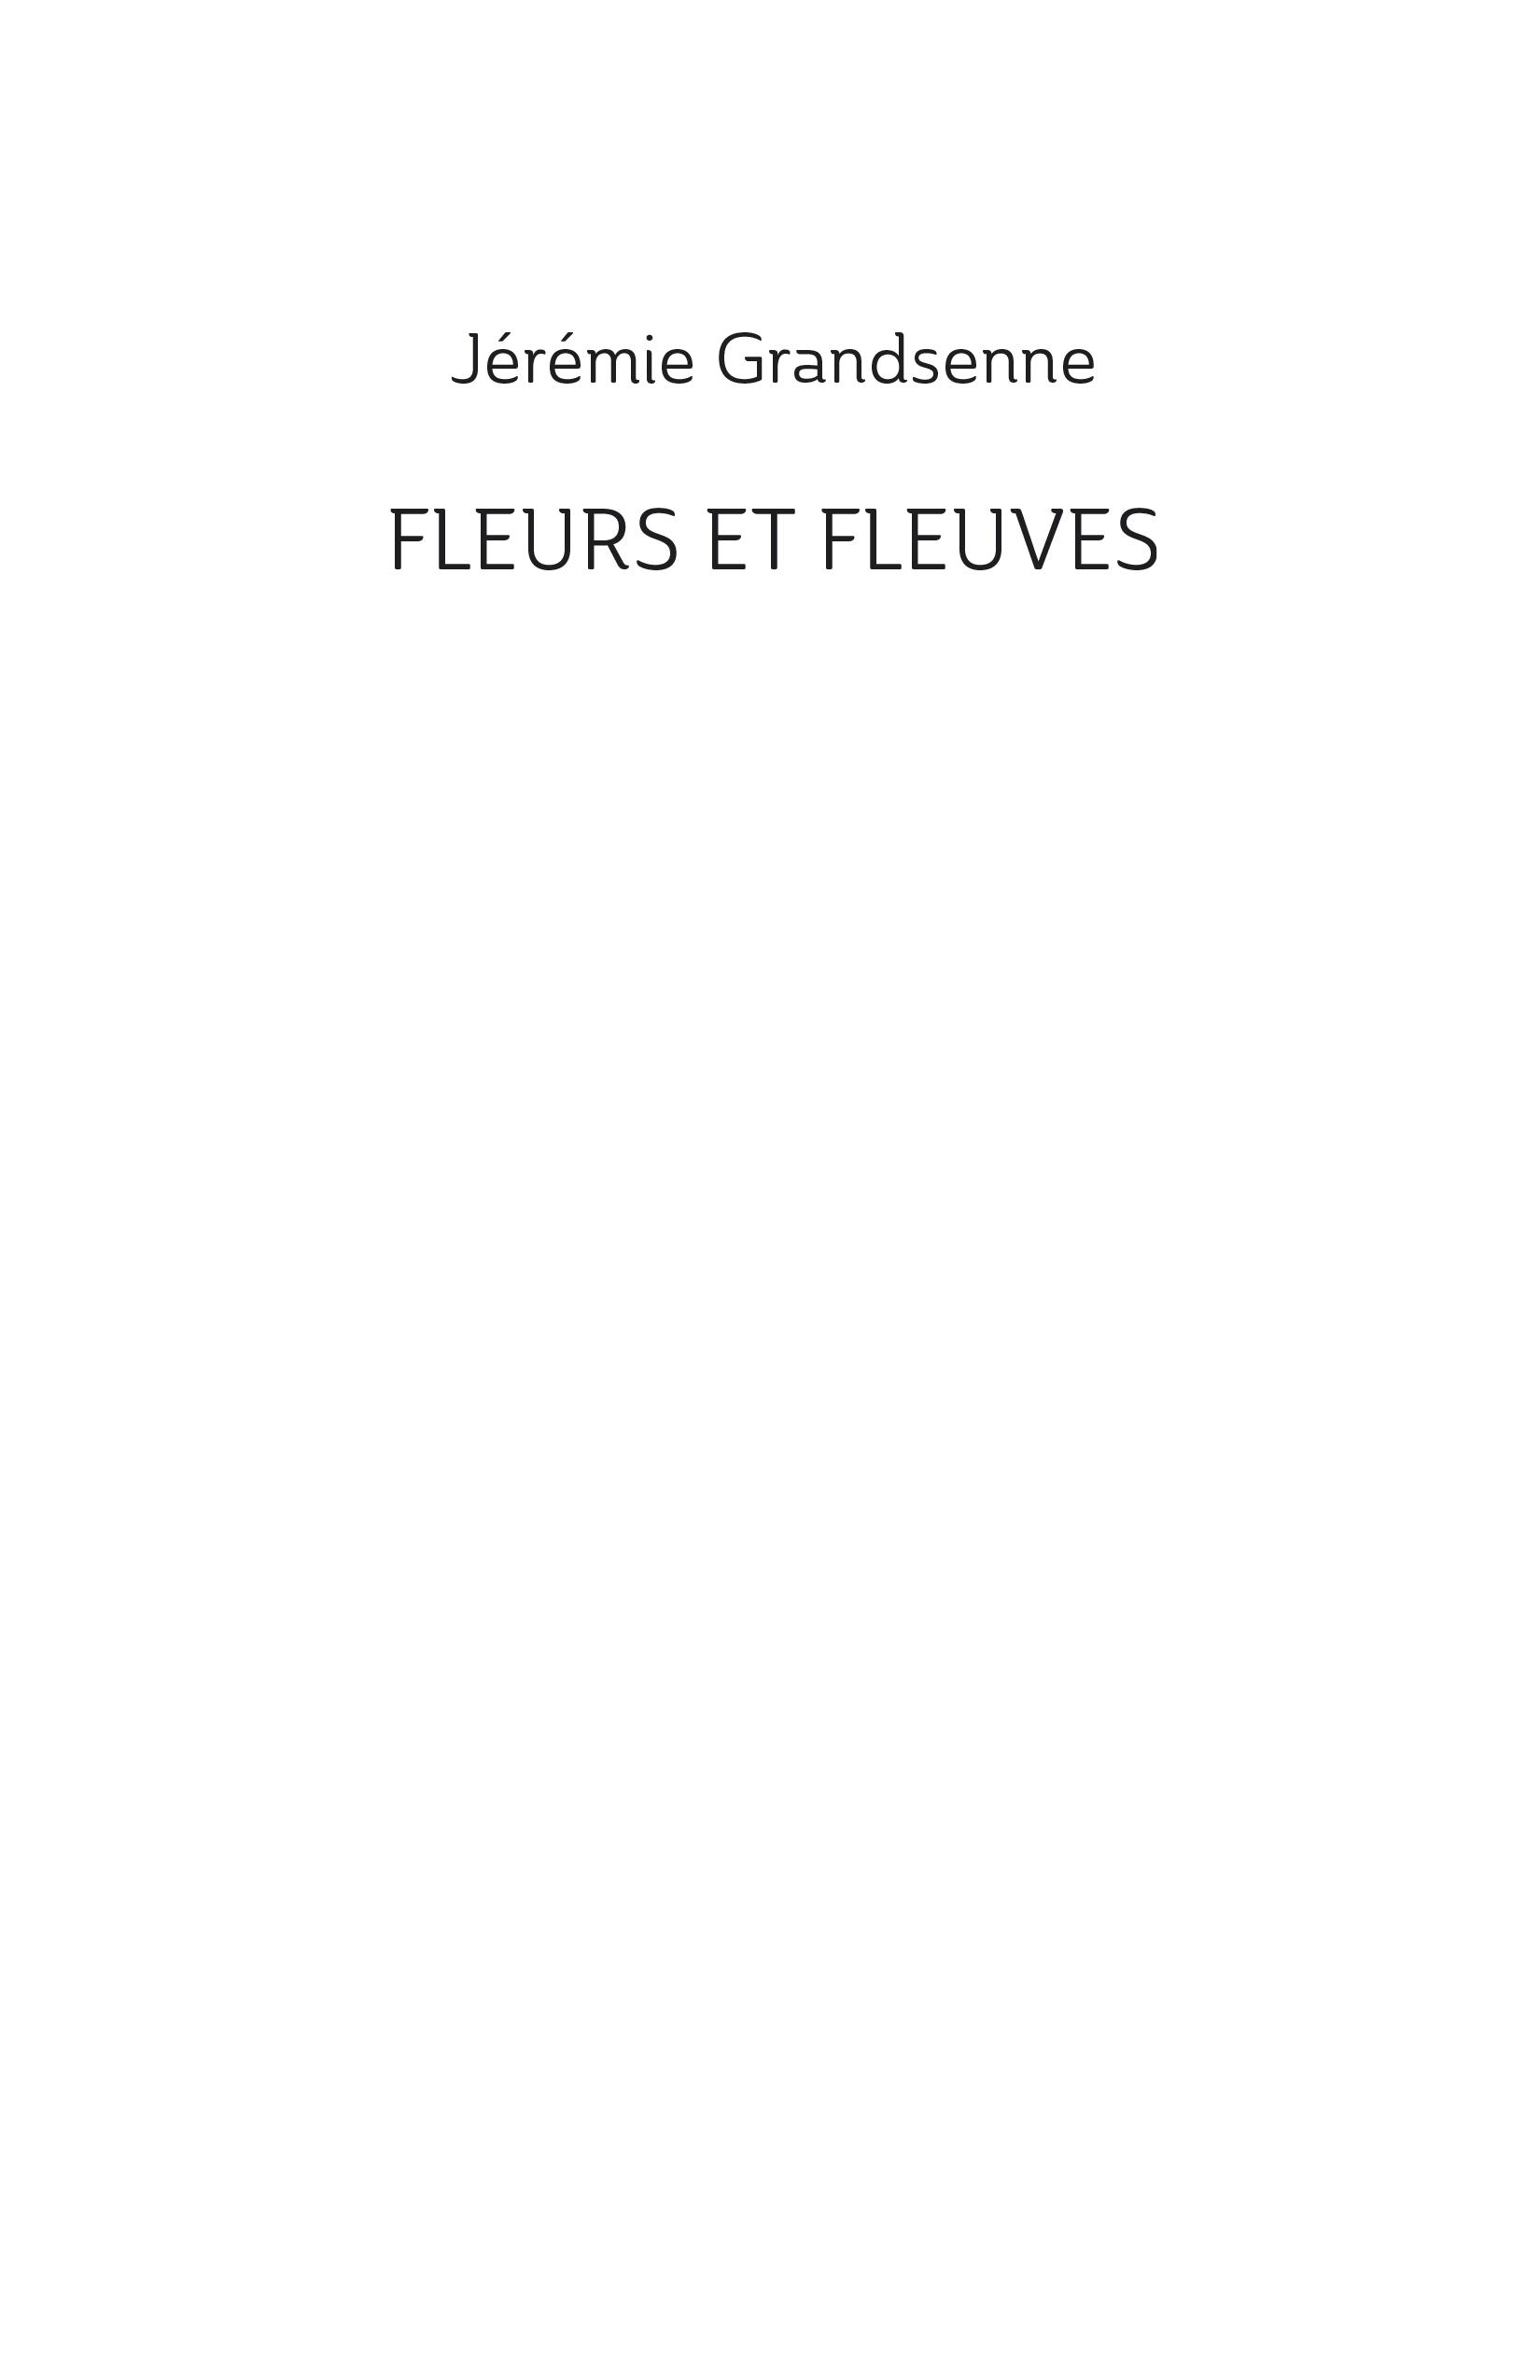 jeremiegrandsenne_fleursetfleuves_couv